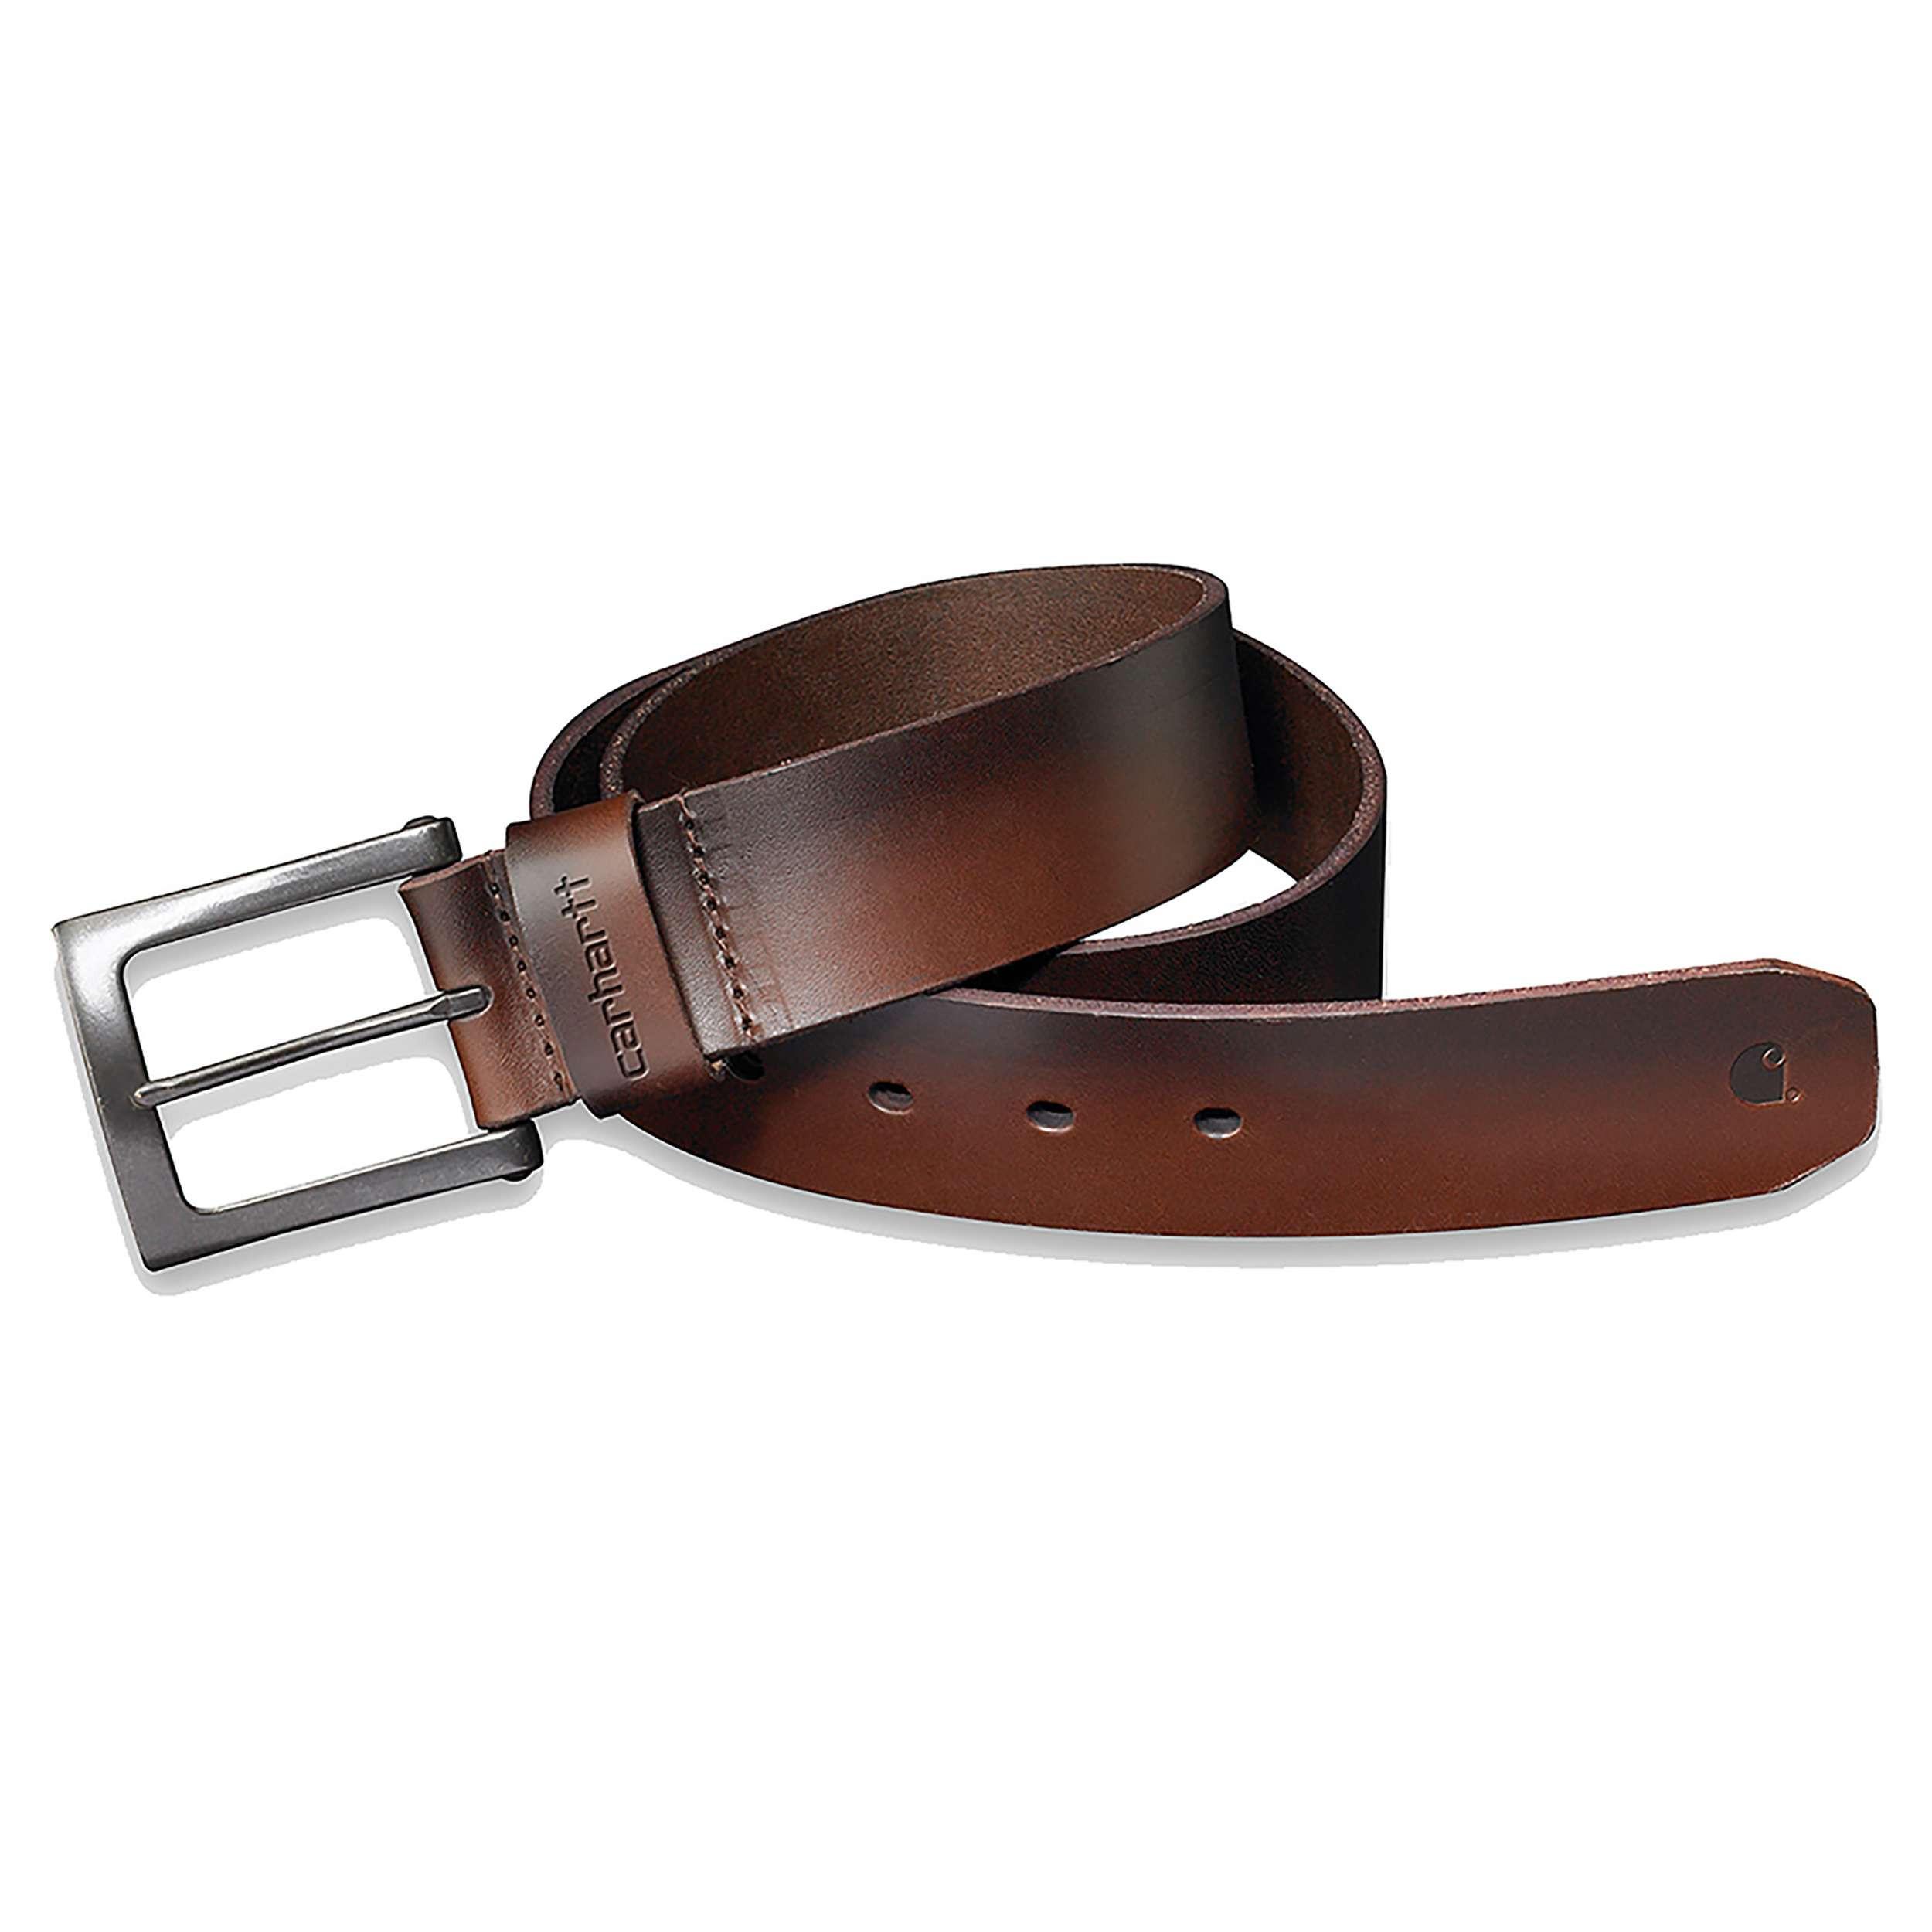 Ремень кожаный Carhartt Anvil Belt - 2203 (Carhartt Brown, W38)